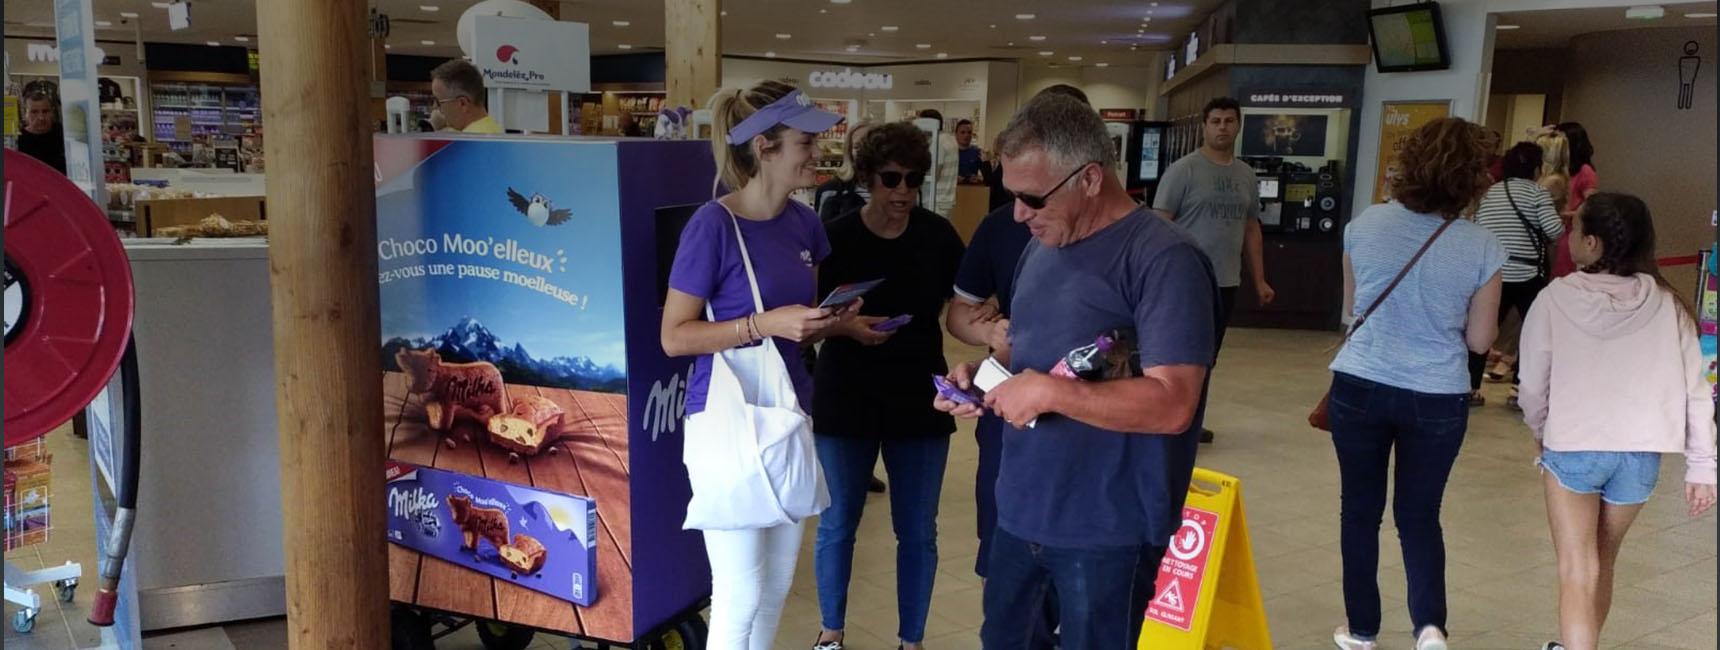 Milka Brand Activation animation outstore street marketing - Keemia shopper agence d'activation shopper marketing phygitale